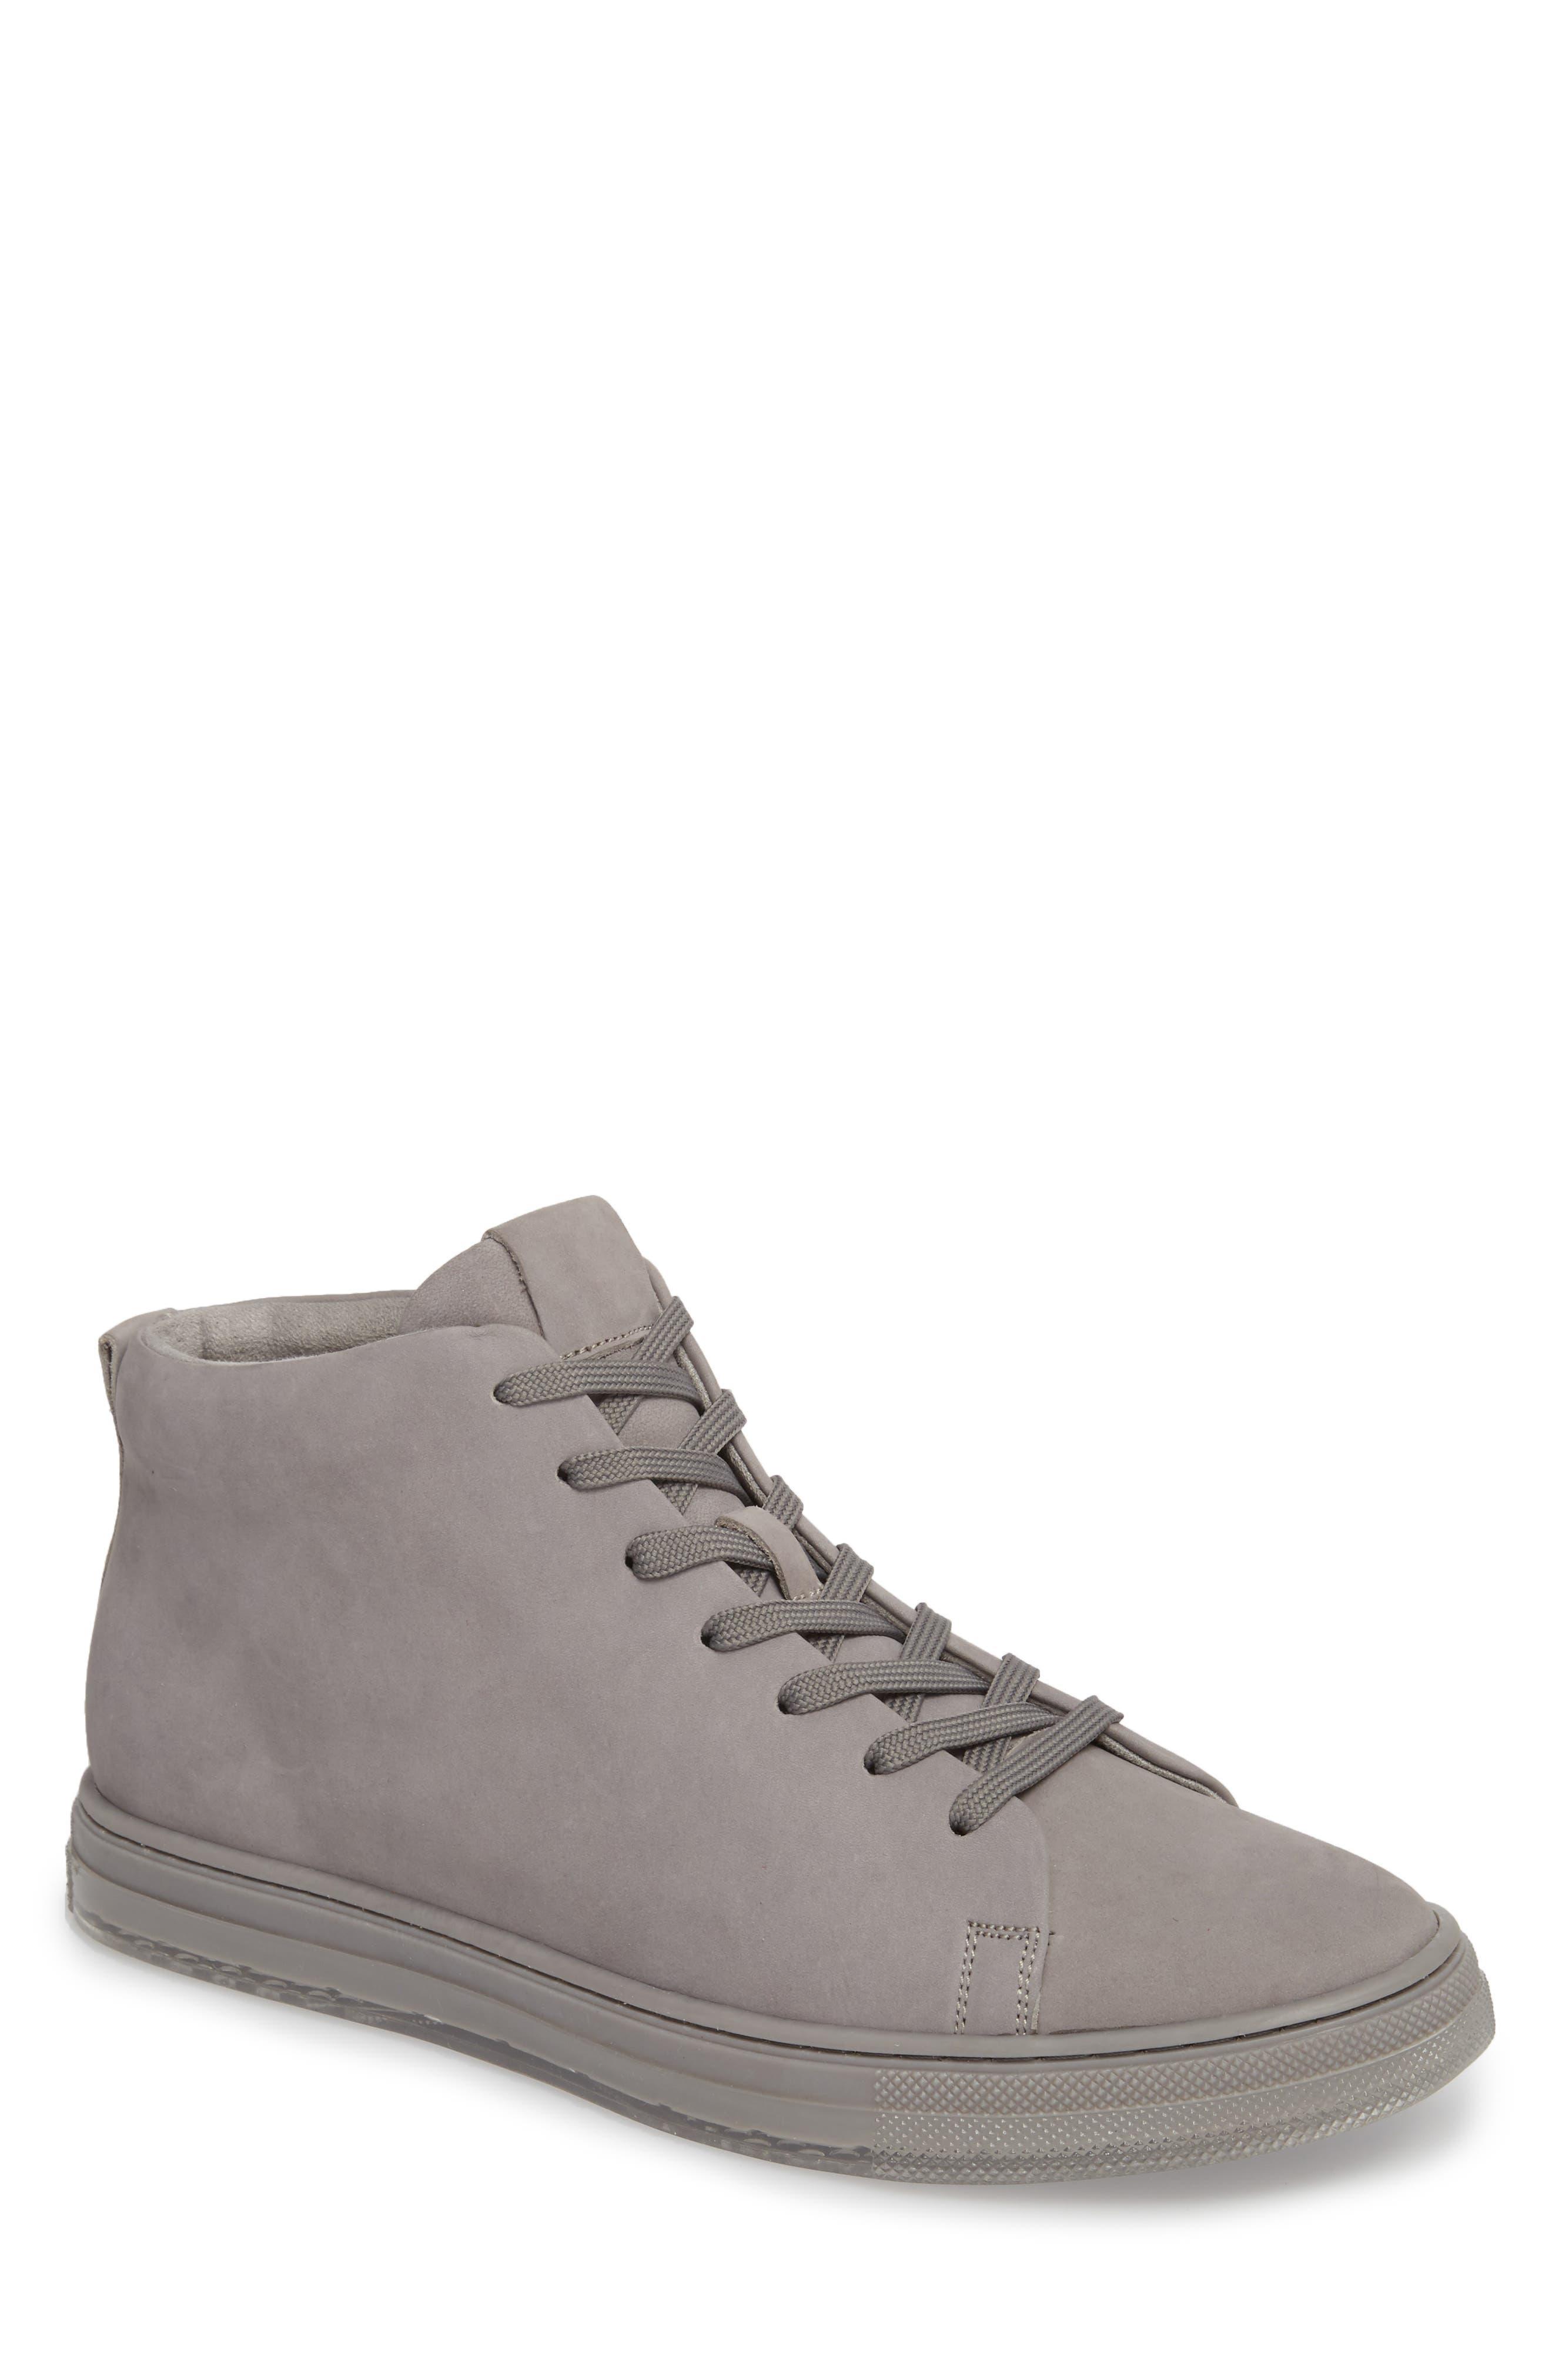 Colvin Sneaker,                             Main thumbnail 1, color,                             050